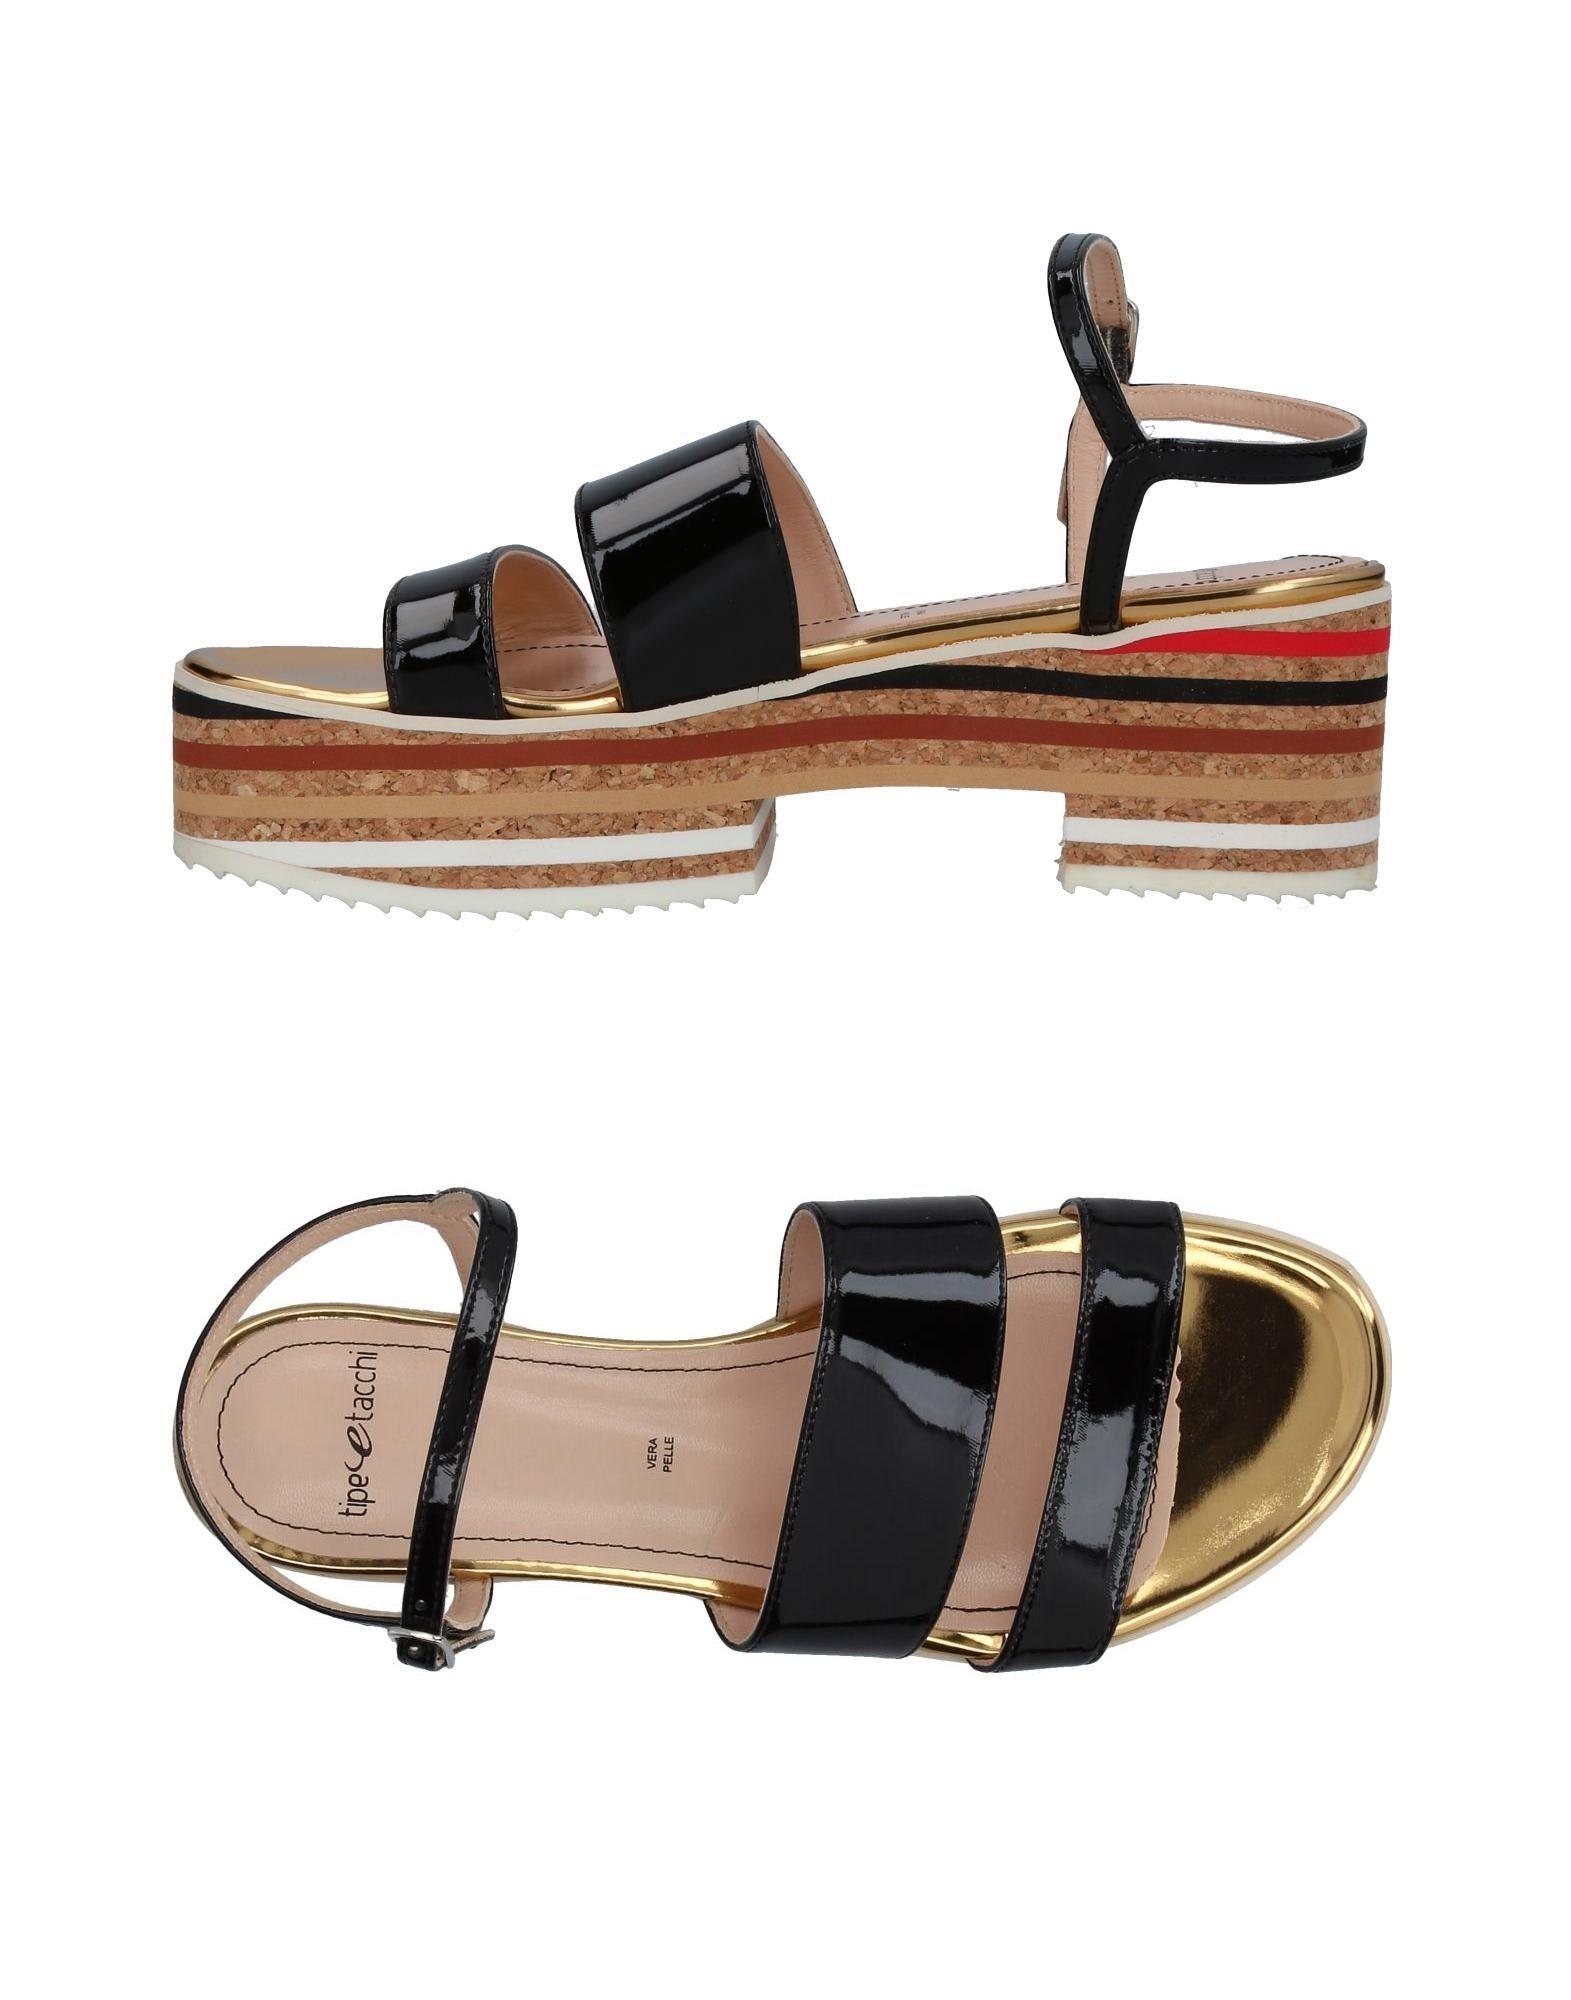 Tipe E Tacchi Sandals - Women E Tipe E Women Tacchi Sandals online on  Canada - 11408449FT 29bbb8